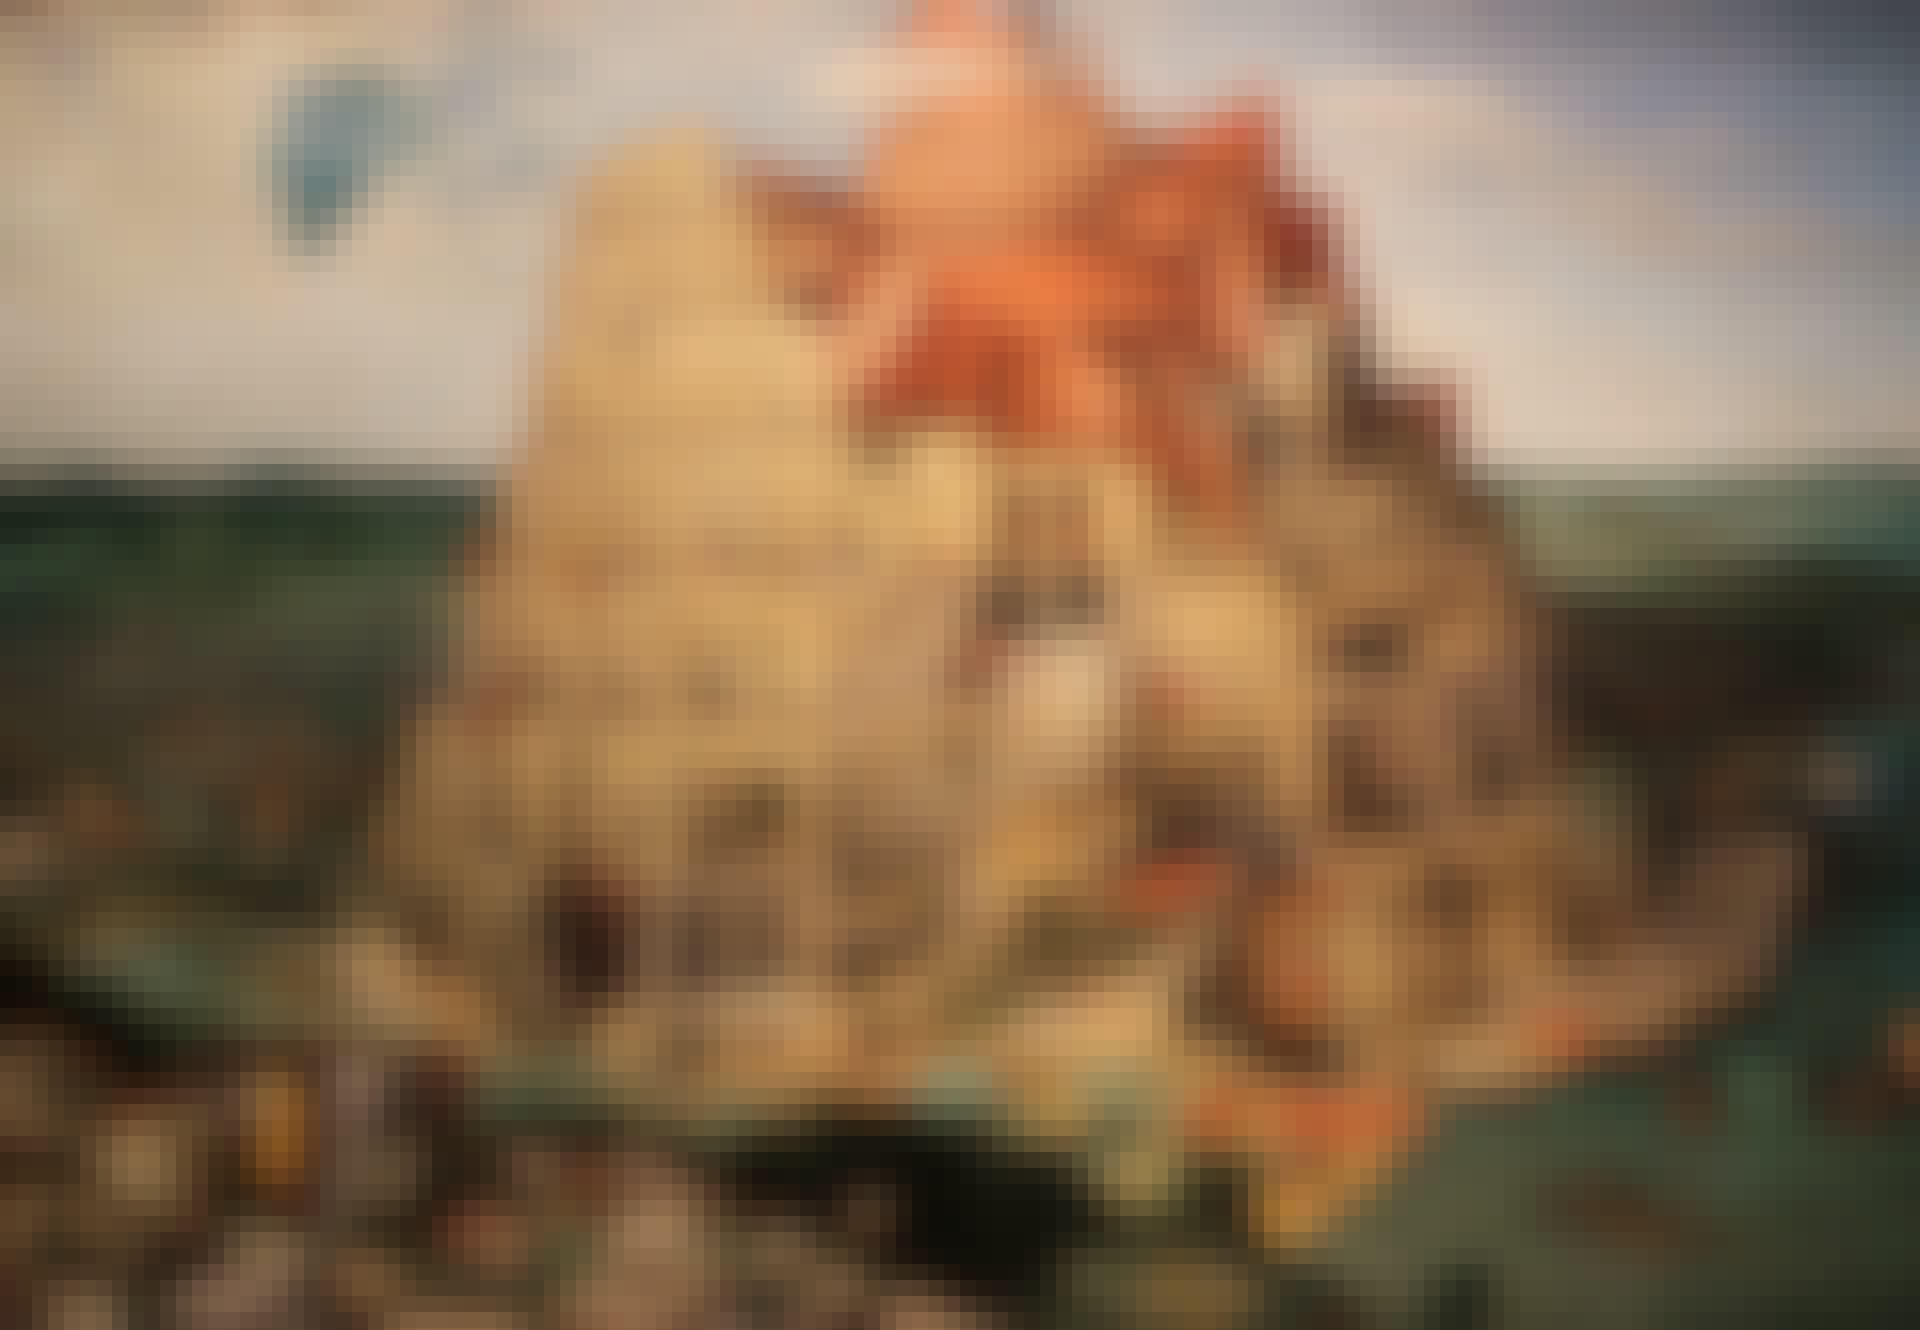 Målning av Babels torn